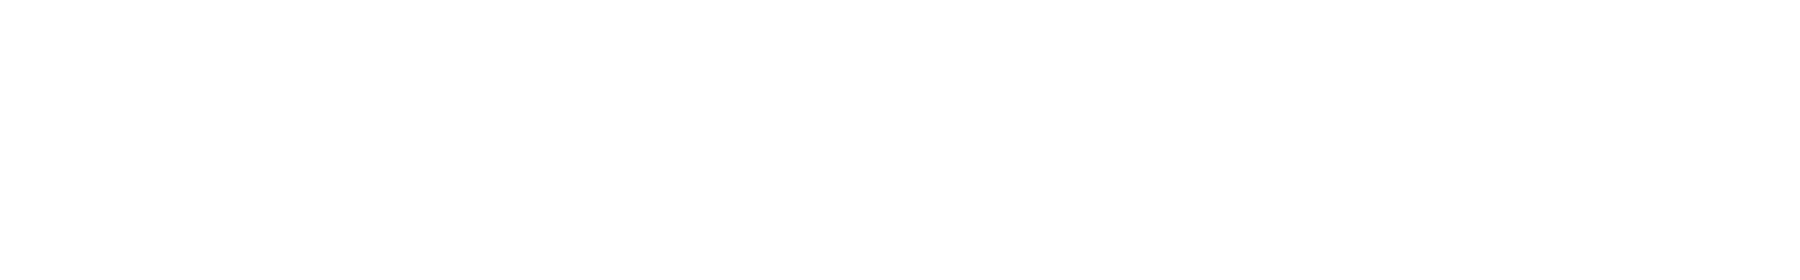 melody 10bpm80keyf